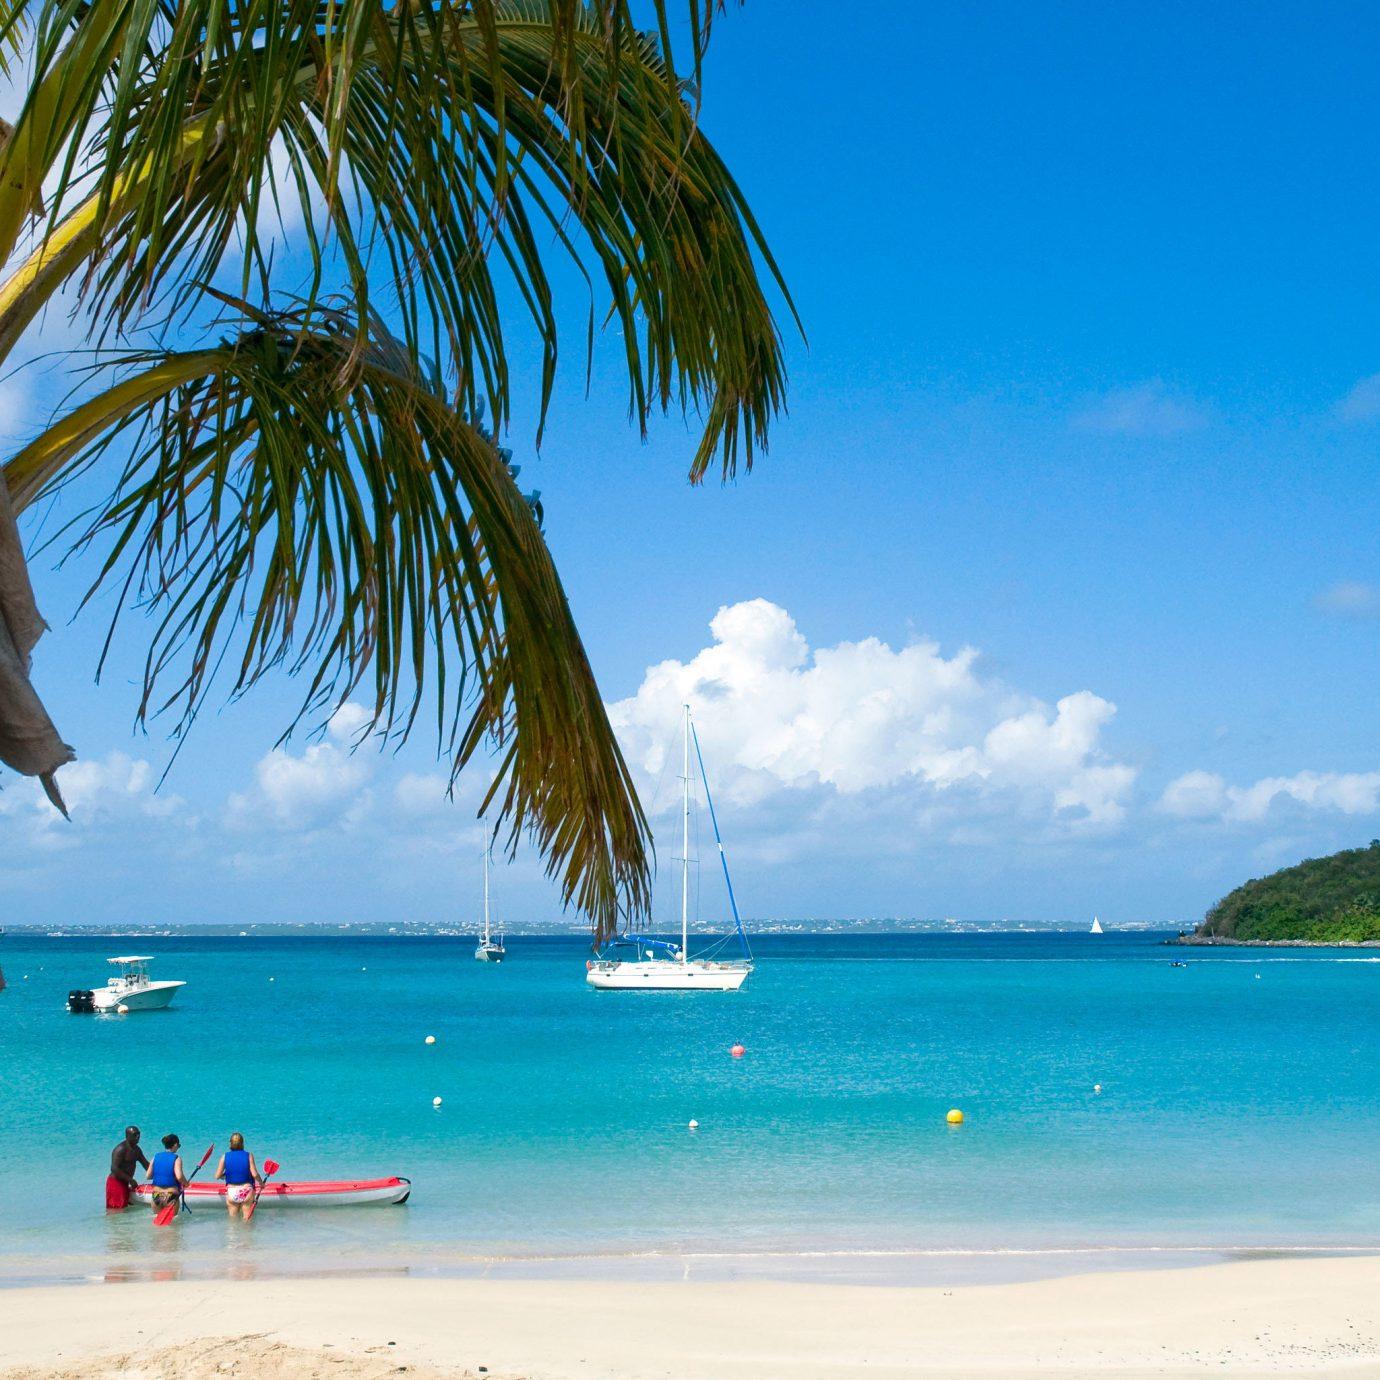 Beach Beachfront Lounge Luxury Ocean sky water tree Sea caribbean palm tropics shore arecales Coast palm family Island cape Lagoon plant sandy swimming day